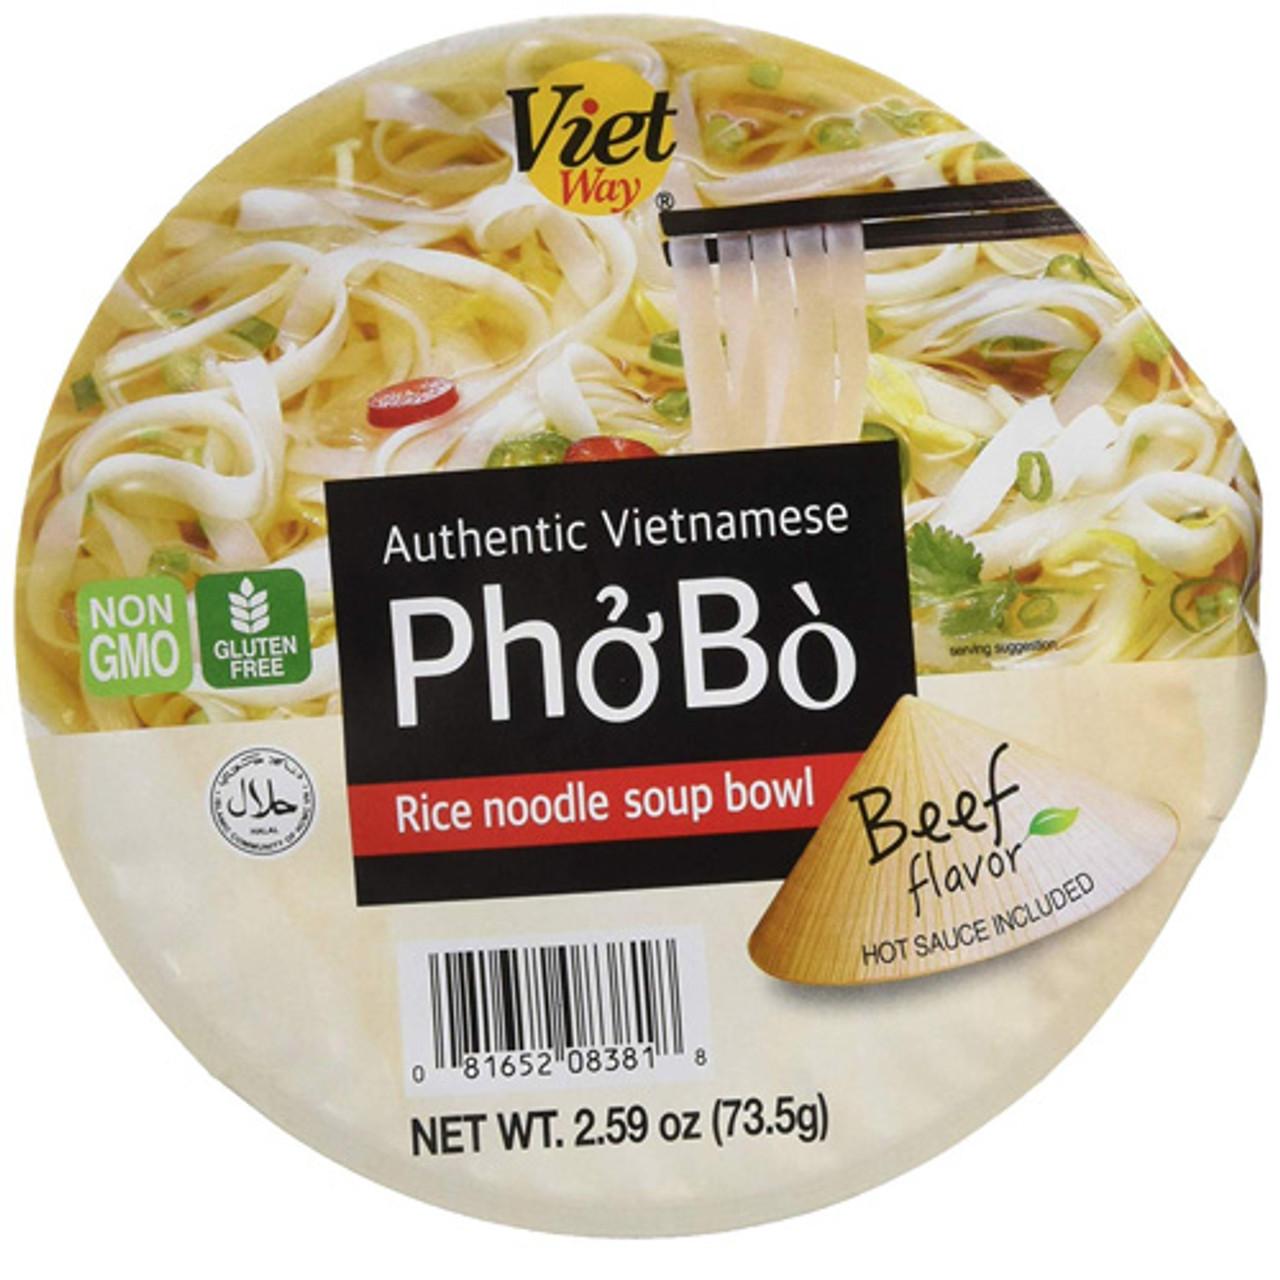 Vietway Instant Authentic Vietnamese Pho Bowl Beef Flavor Wynmarket